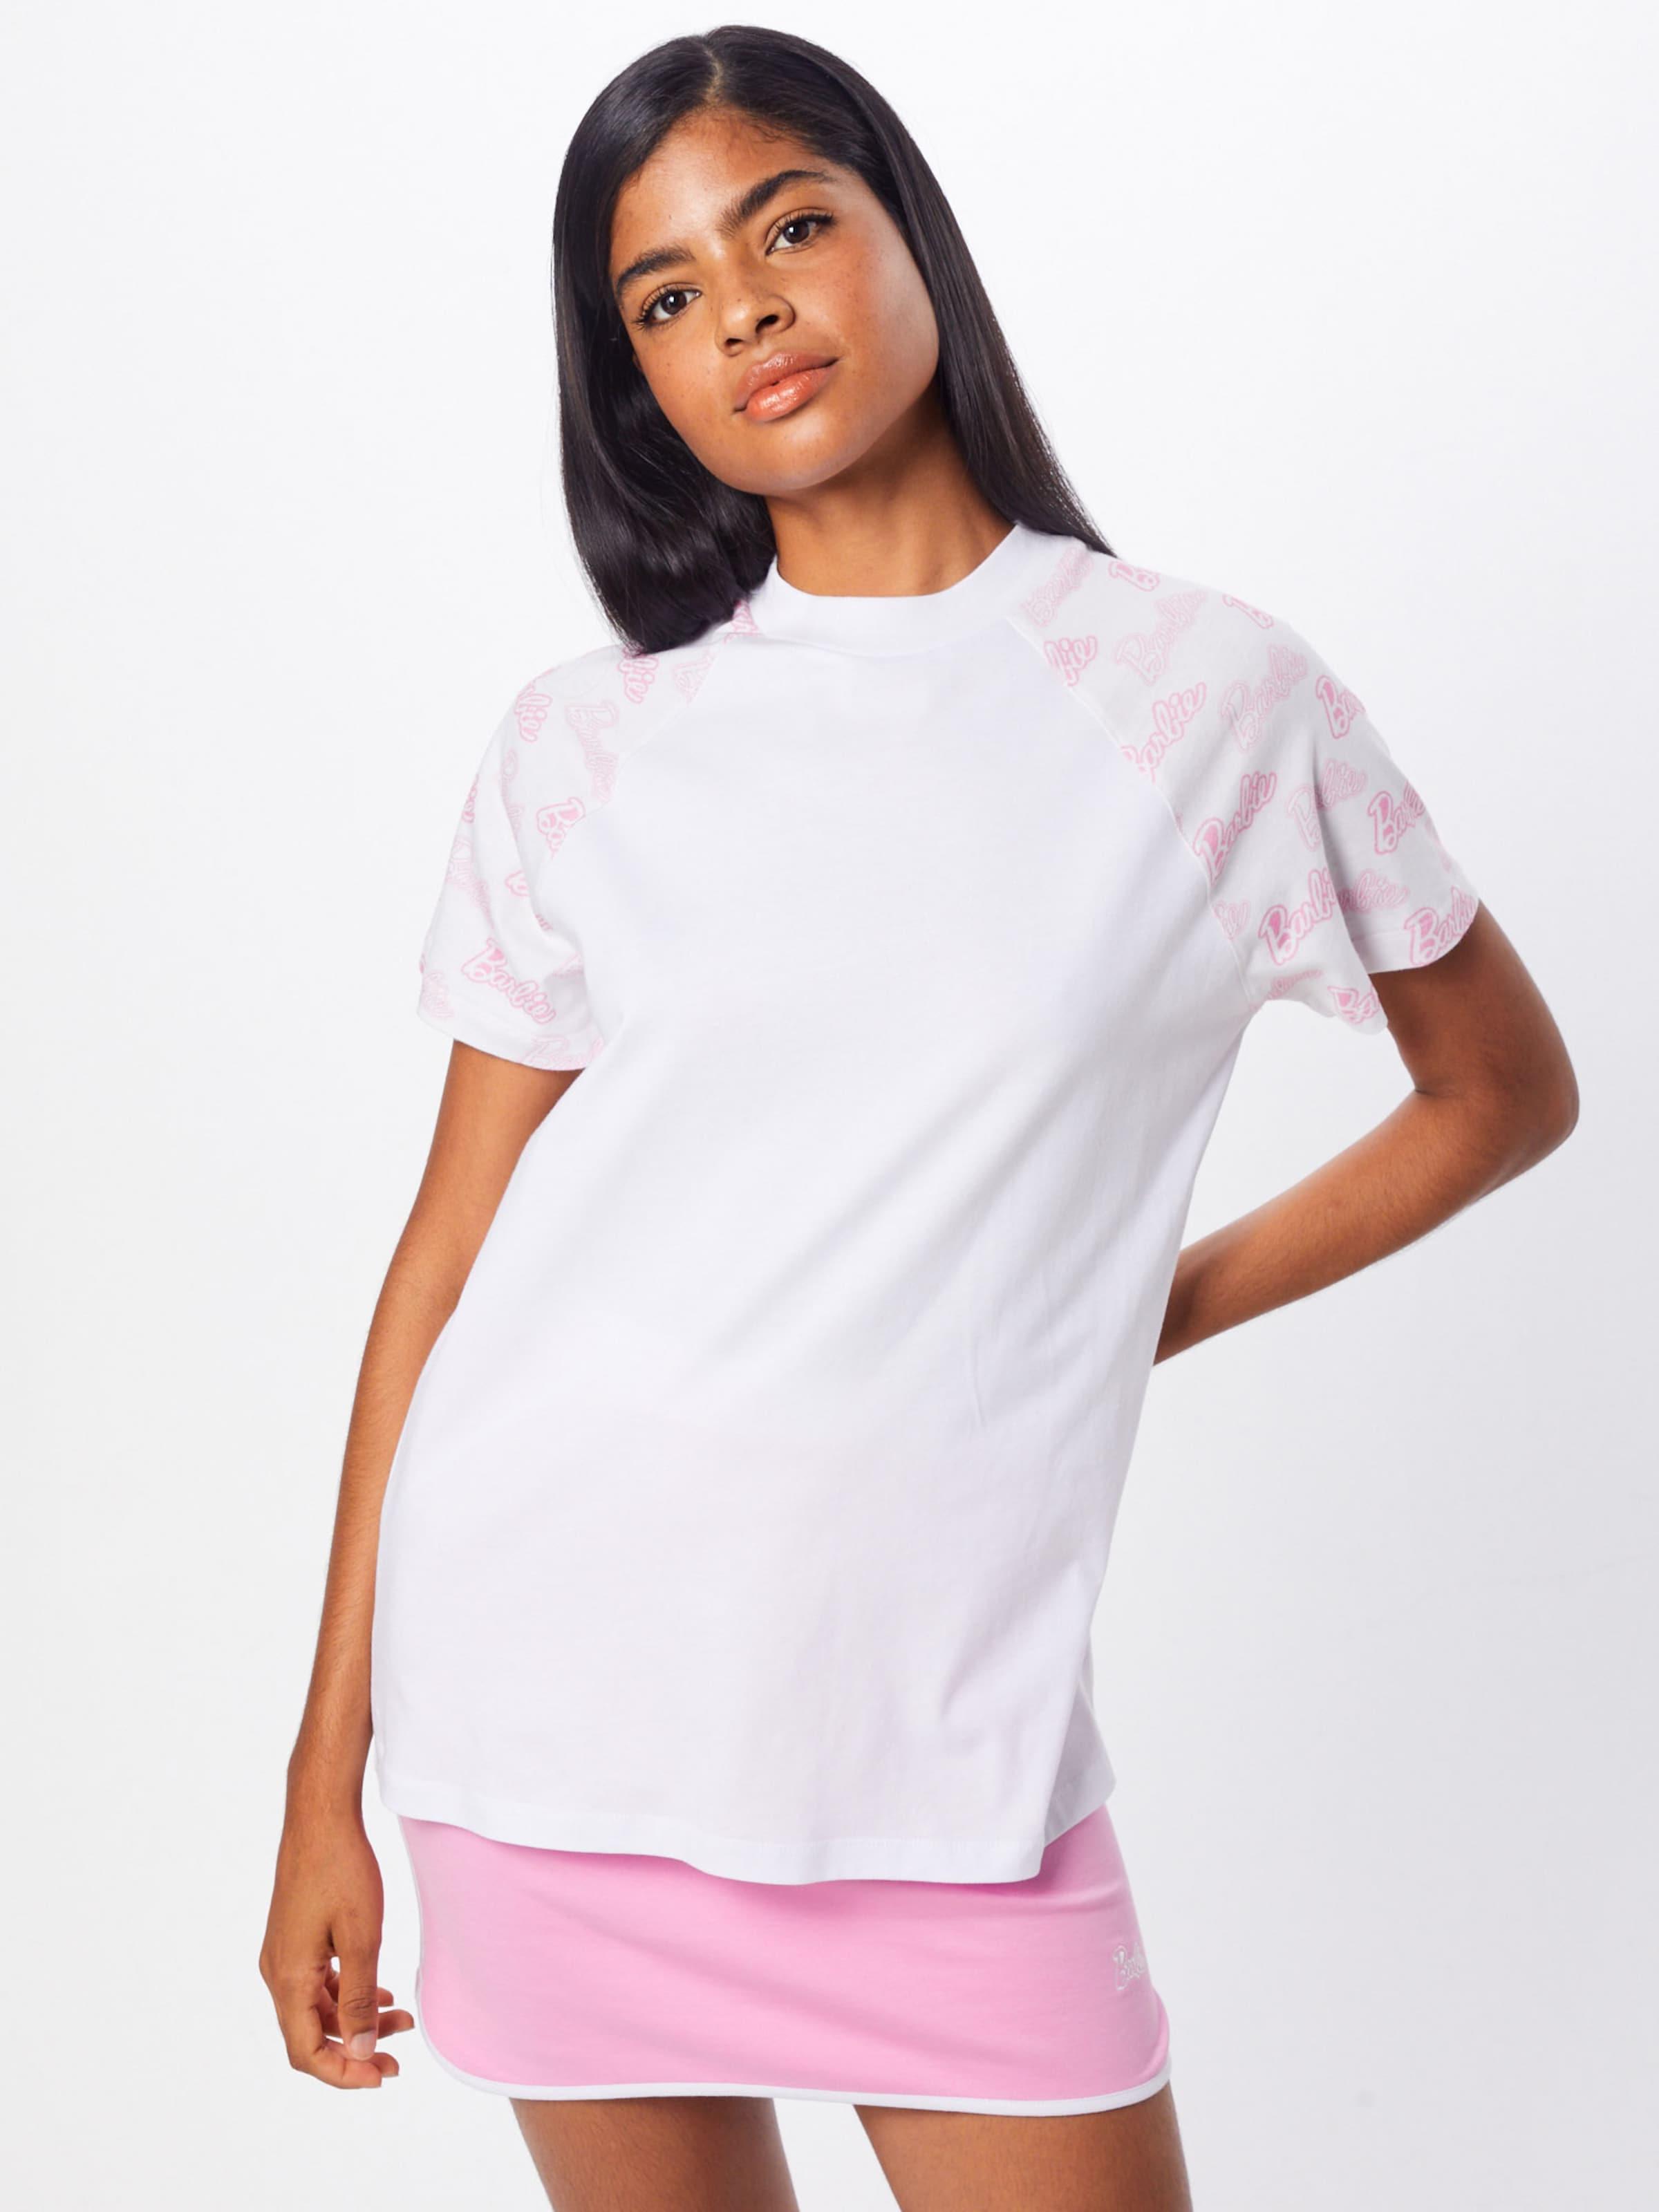 You 'bianca' About X Barbie shirt In T Weiß PkZiXOu